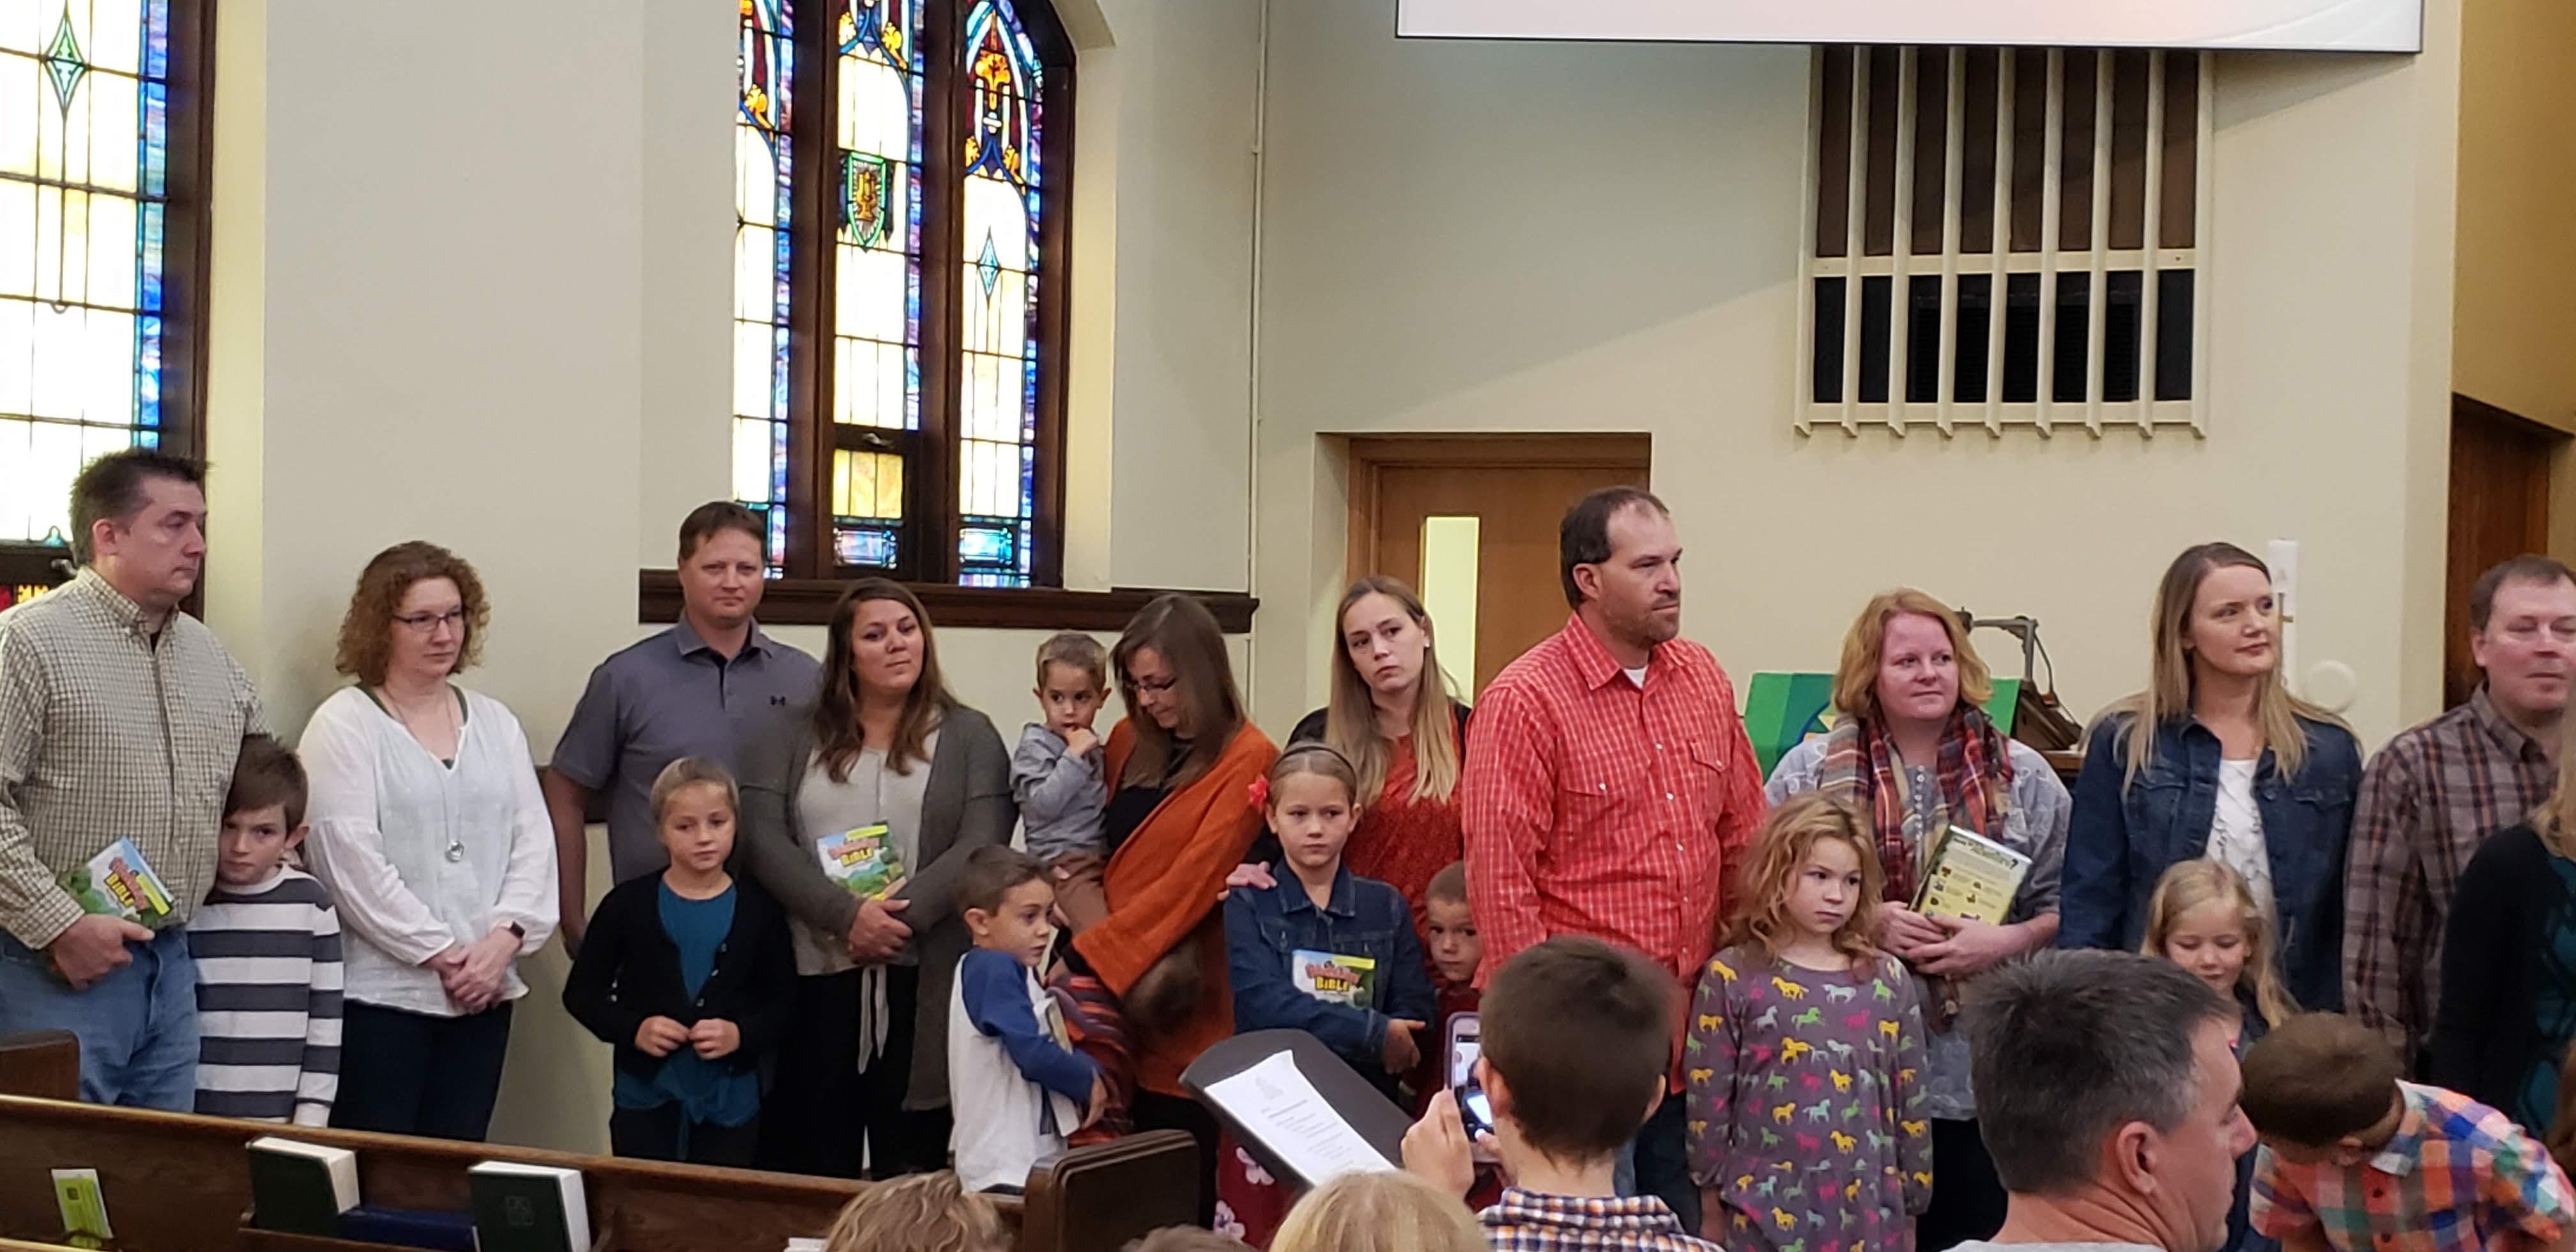 Children's Bible presentation oct 2019 5